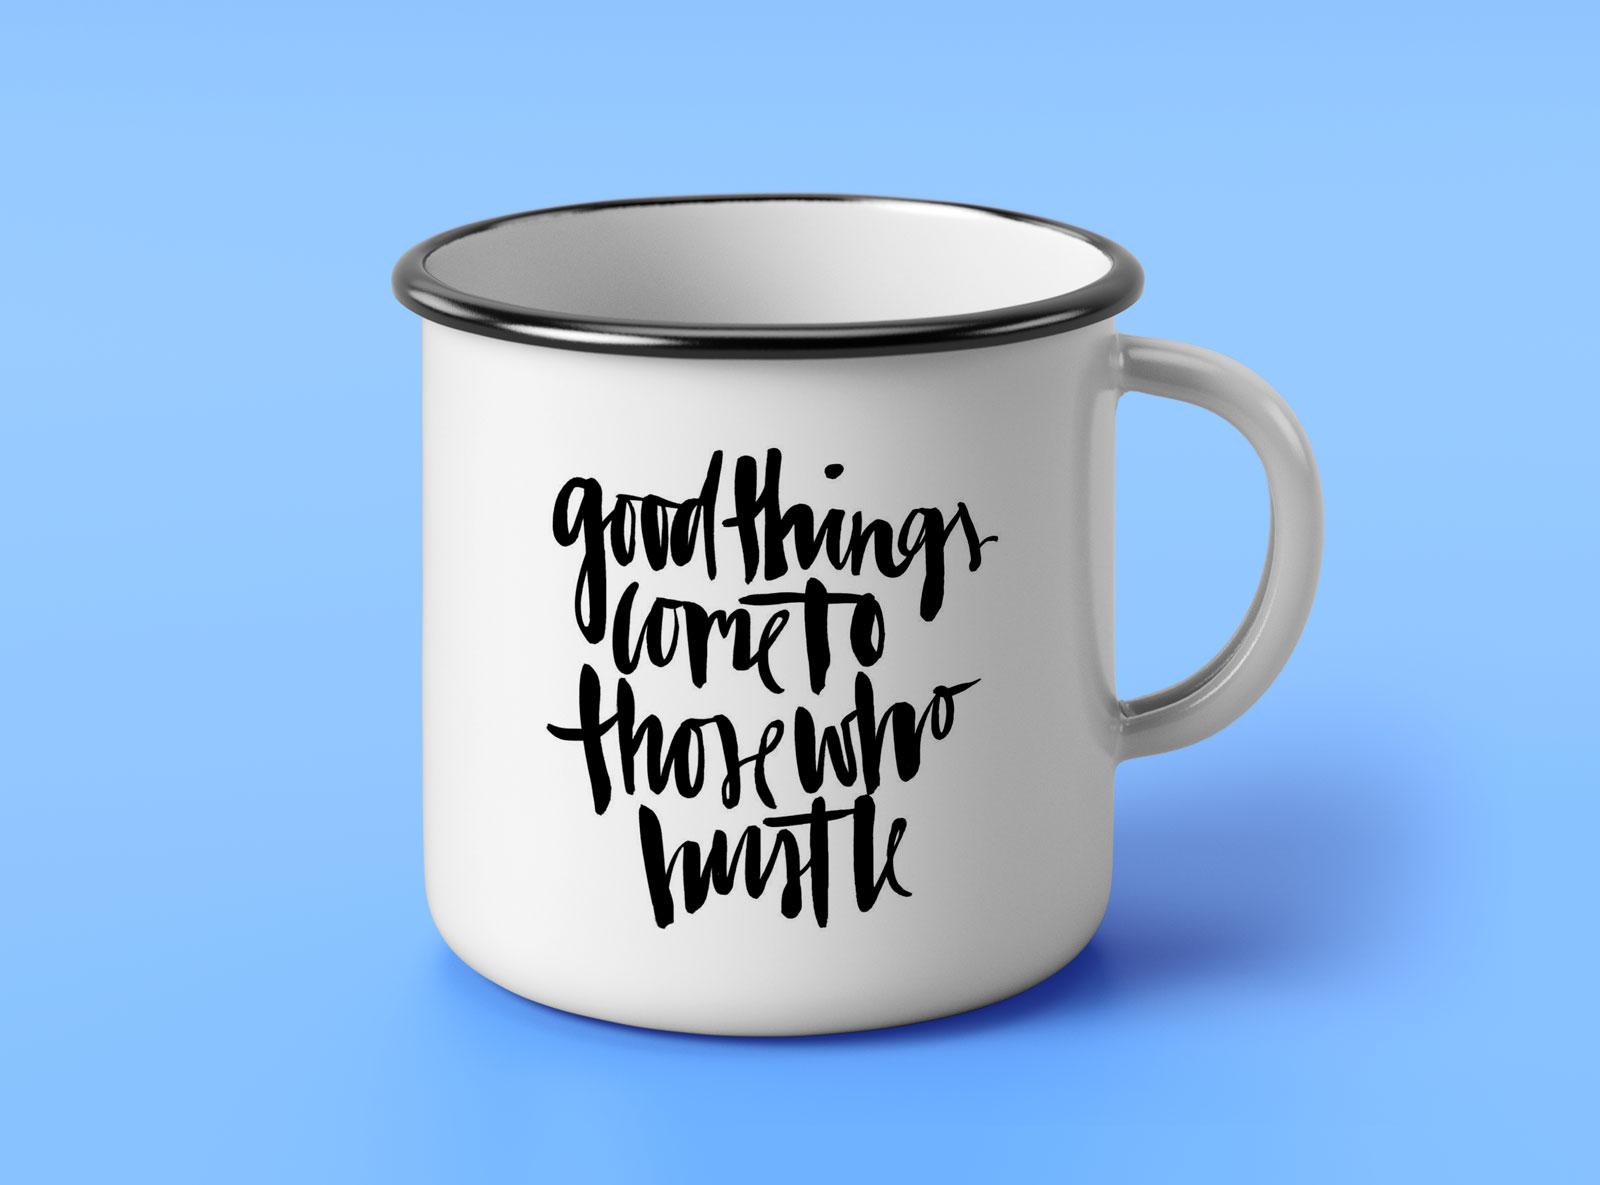 Free-Coffee-Tea-Cup-Mockup-PSD-File